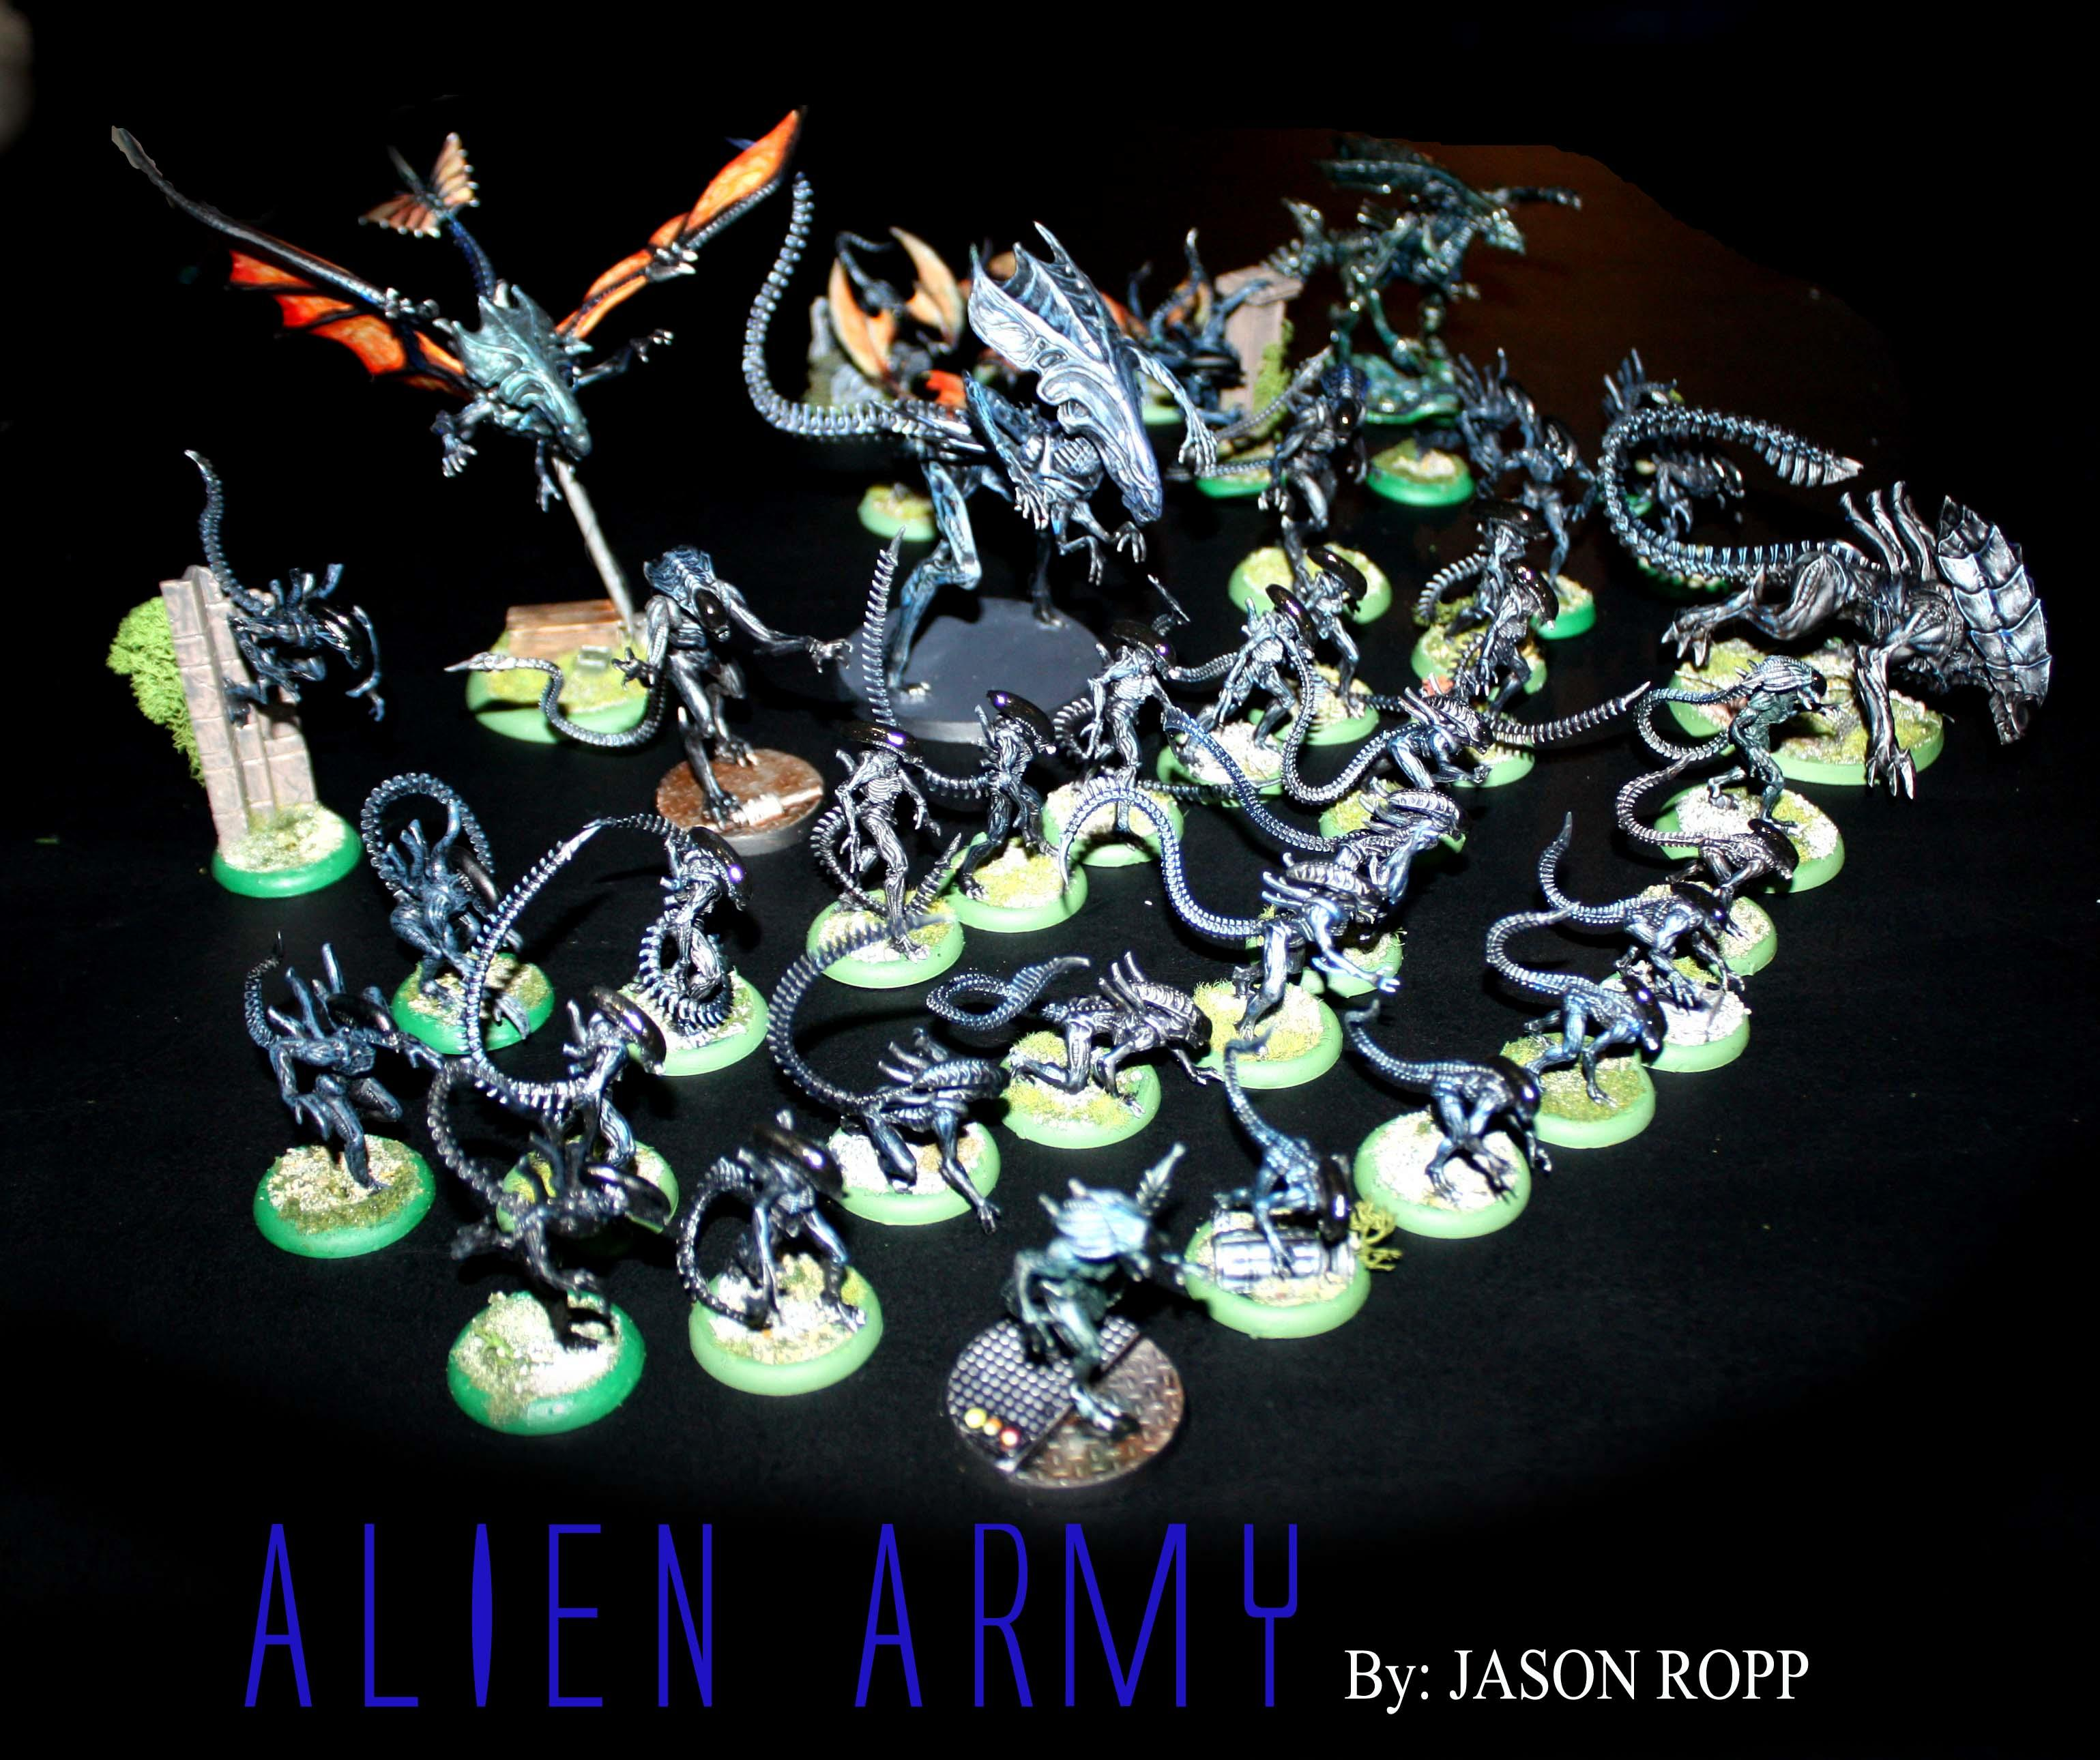 28mm, 32mm, Alien, Alienids, Army, Avp, Crusher, Flying Queen, Game, Prodps, Stalkers, Tyranids, Wargame, Wargamer, Warriors, Xenomorph